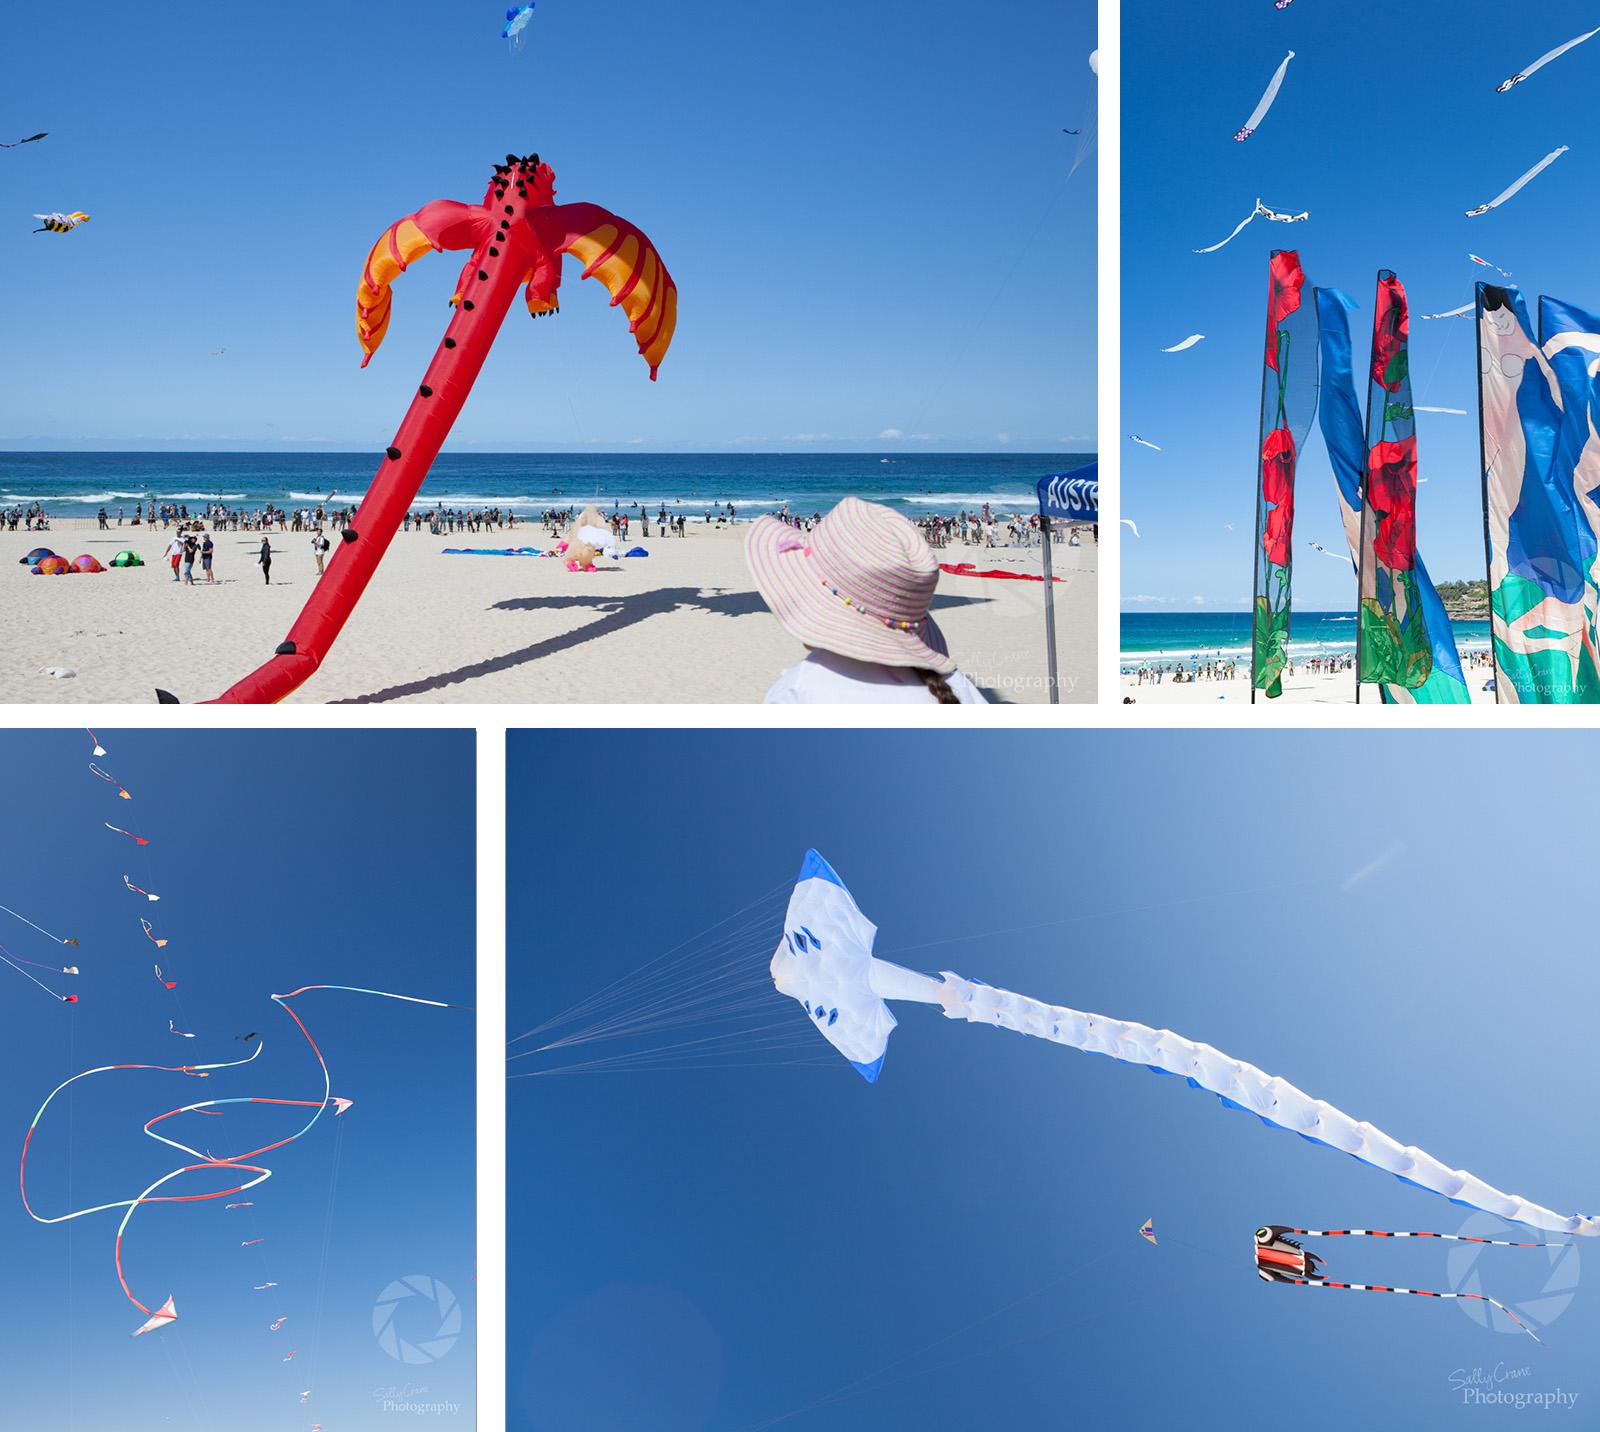 sally_crane_travel_photographer_bondi_kites.jpg